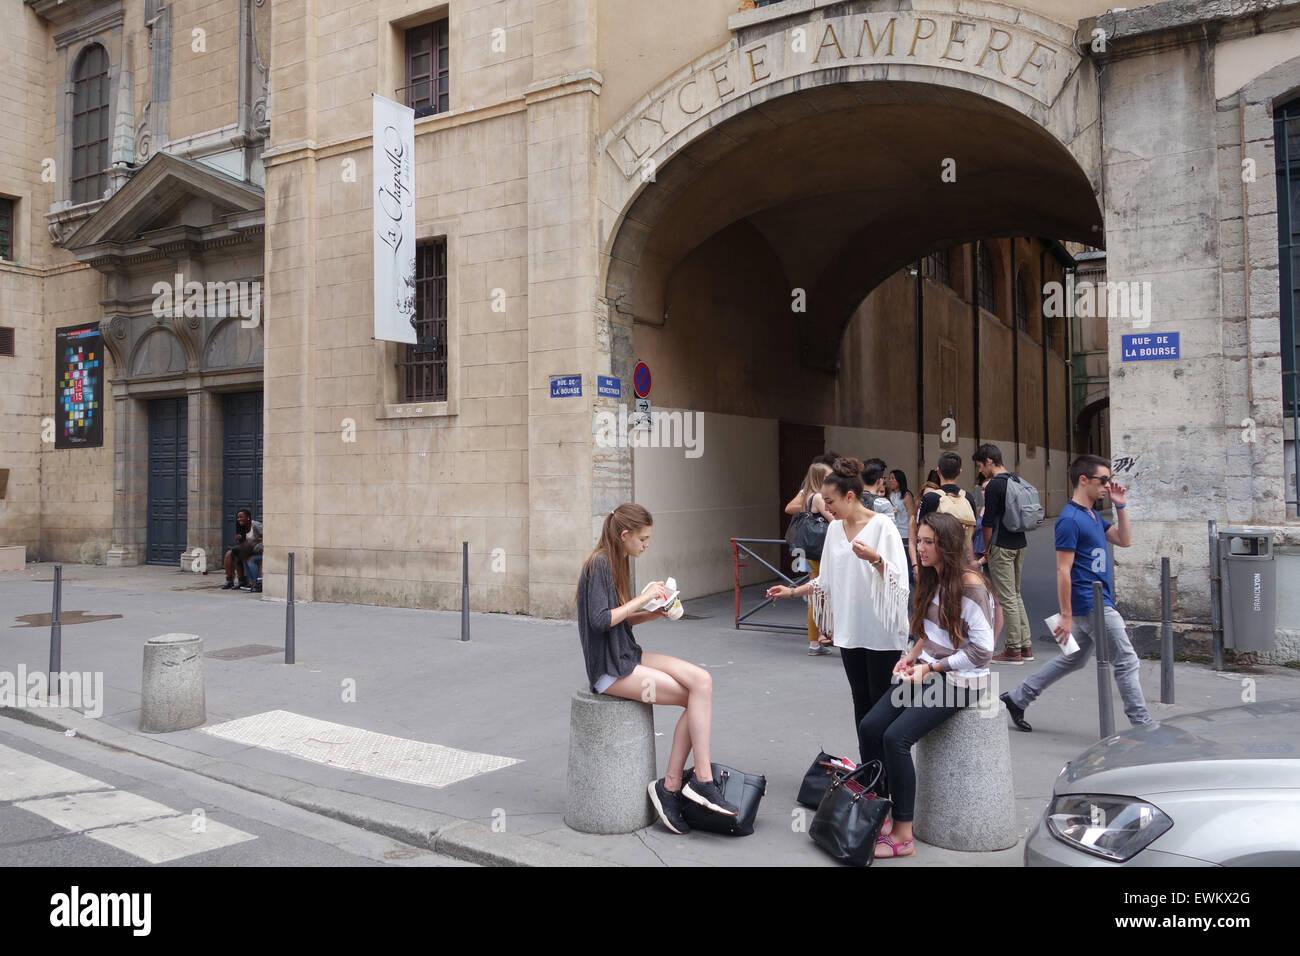 Studenten Schüler Oustide Lycee Ampere College in Lyon Frankreich Stockbild